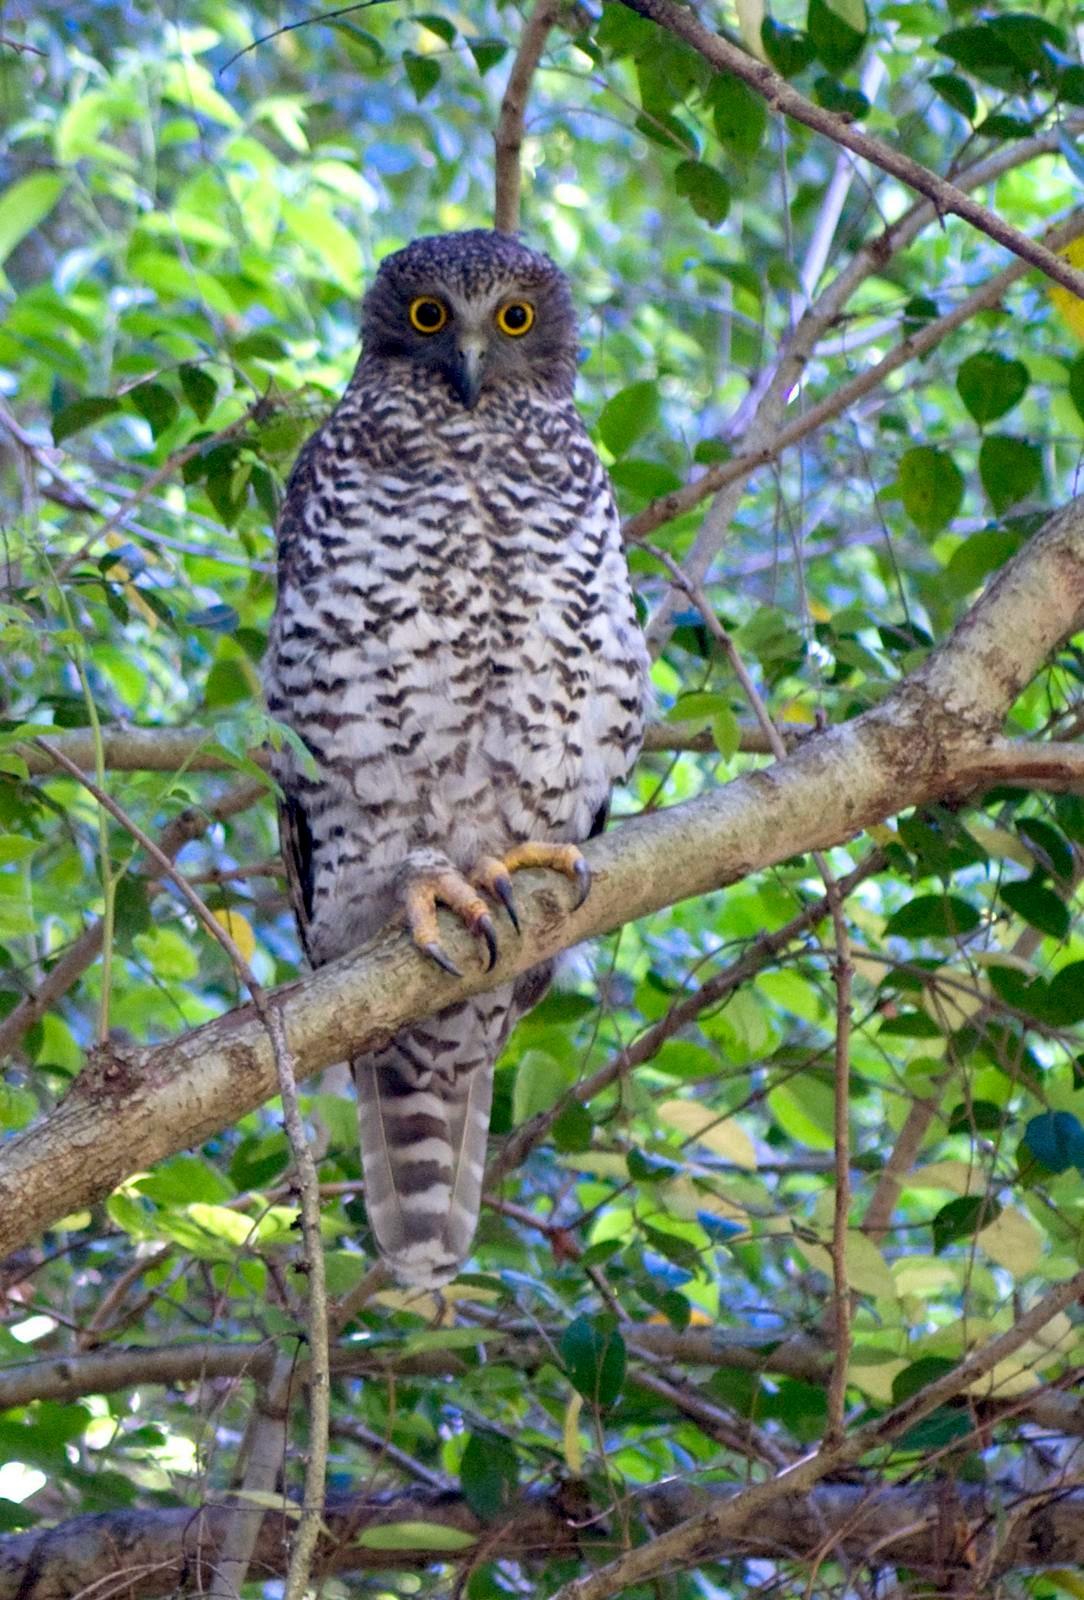 Powerful Owl Habitat Threatened In Moreton Bay Area 11 03